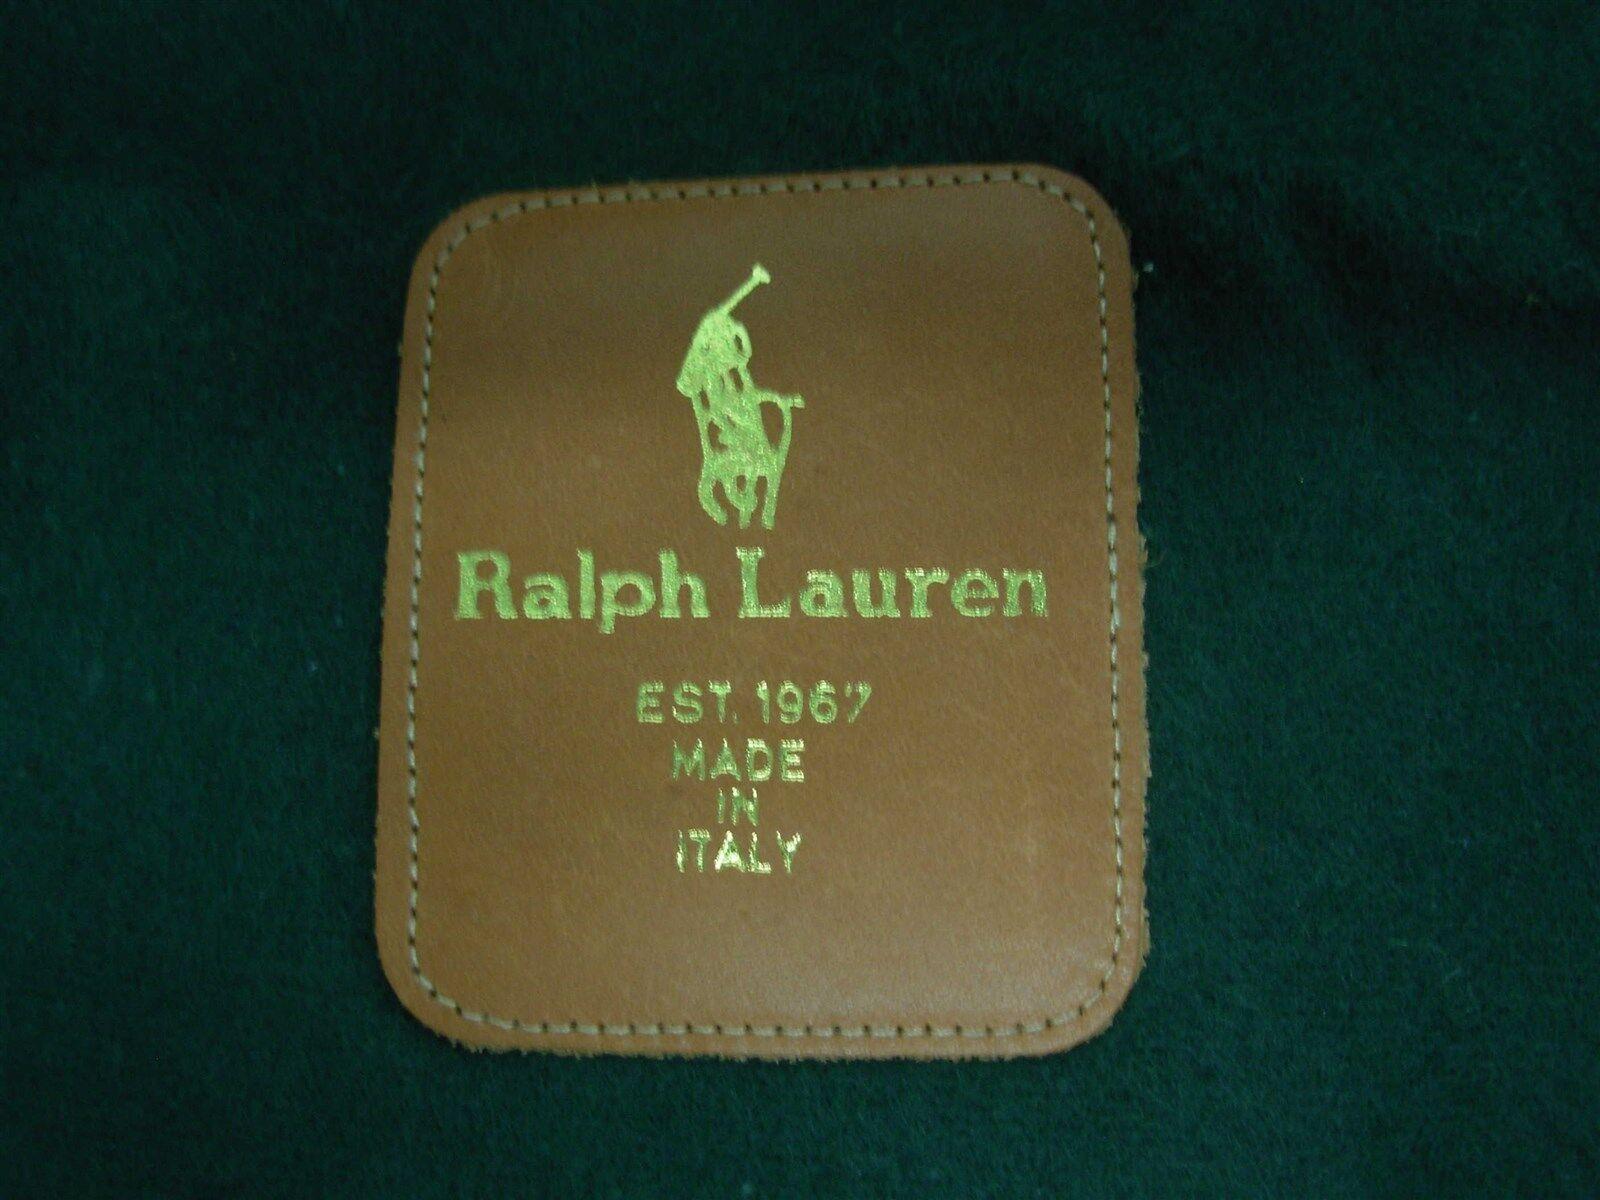 RALPH RALPH RALPH LAUREN ITALY schwarz LEATHER damen HIGH Stiefel GRIFFIN BUCKLE LOGO SZ 6 1 2 45ece9